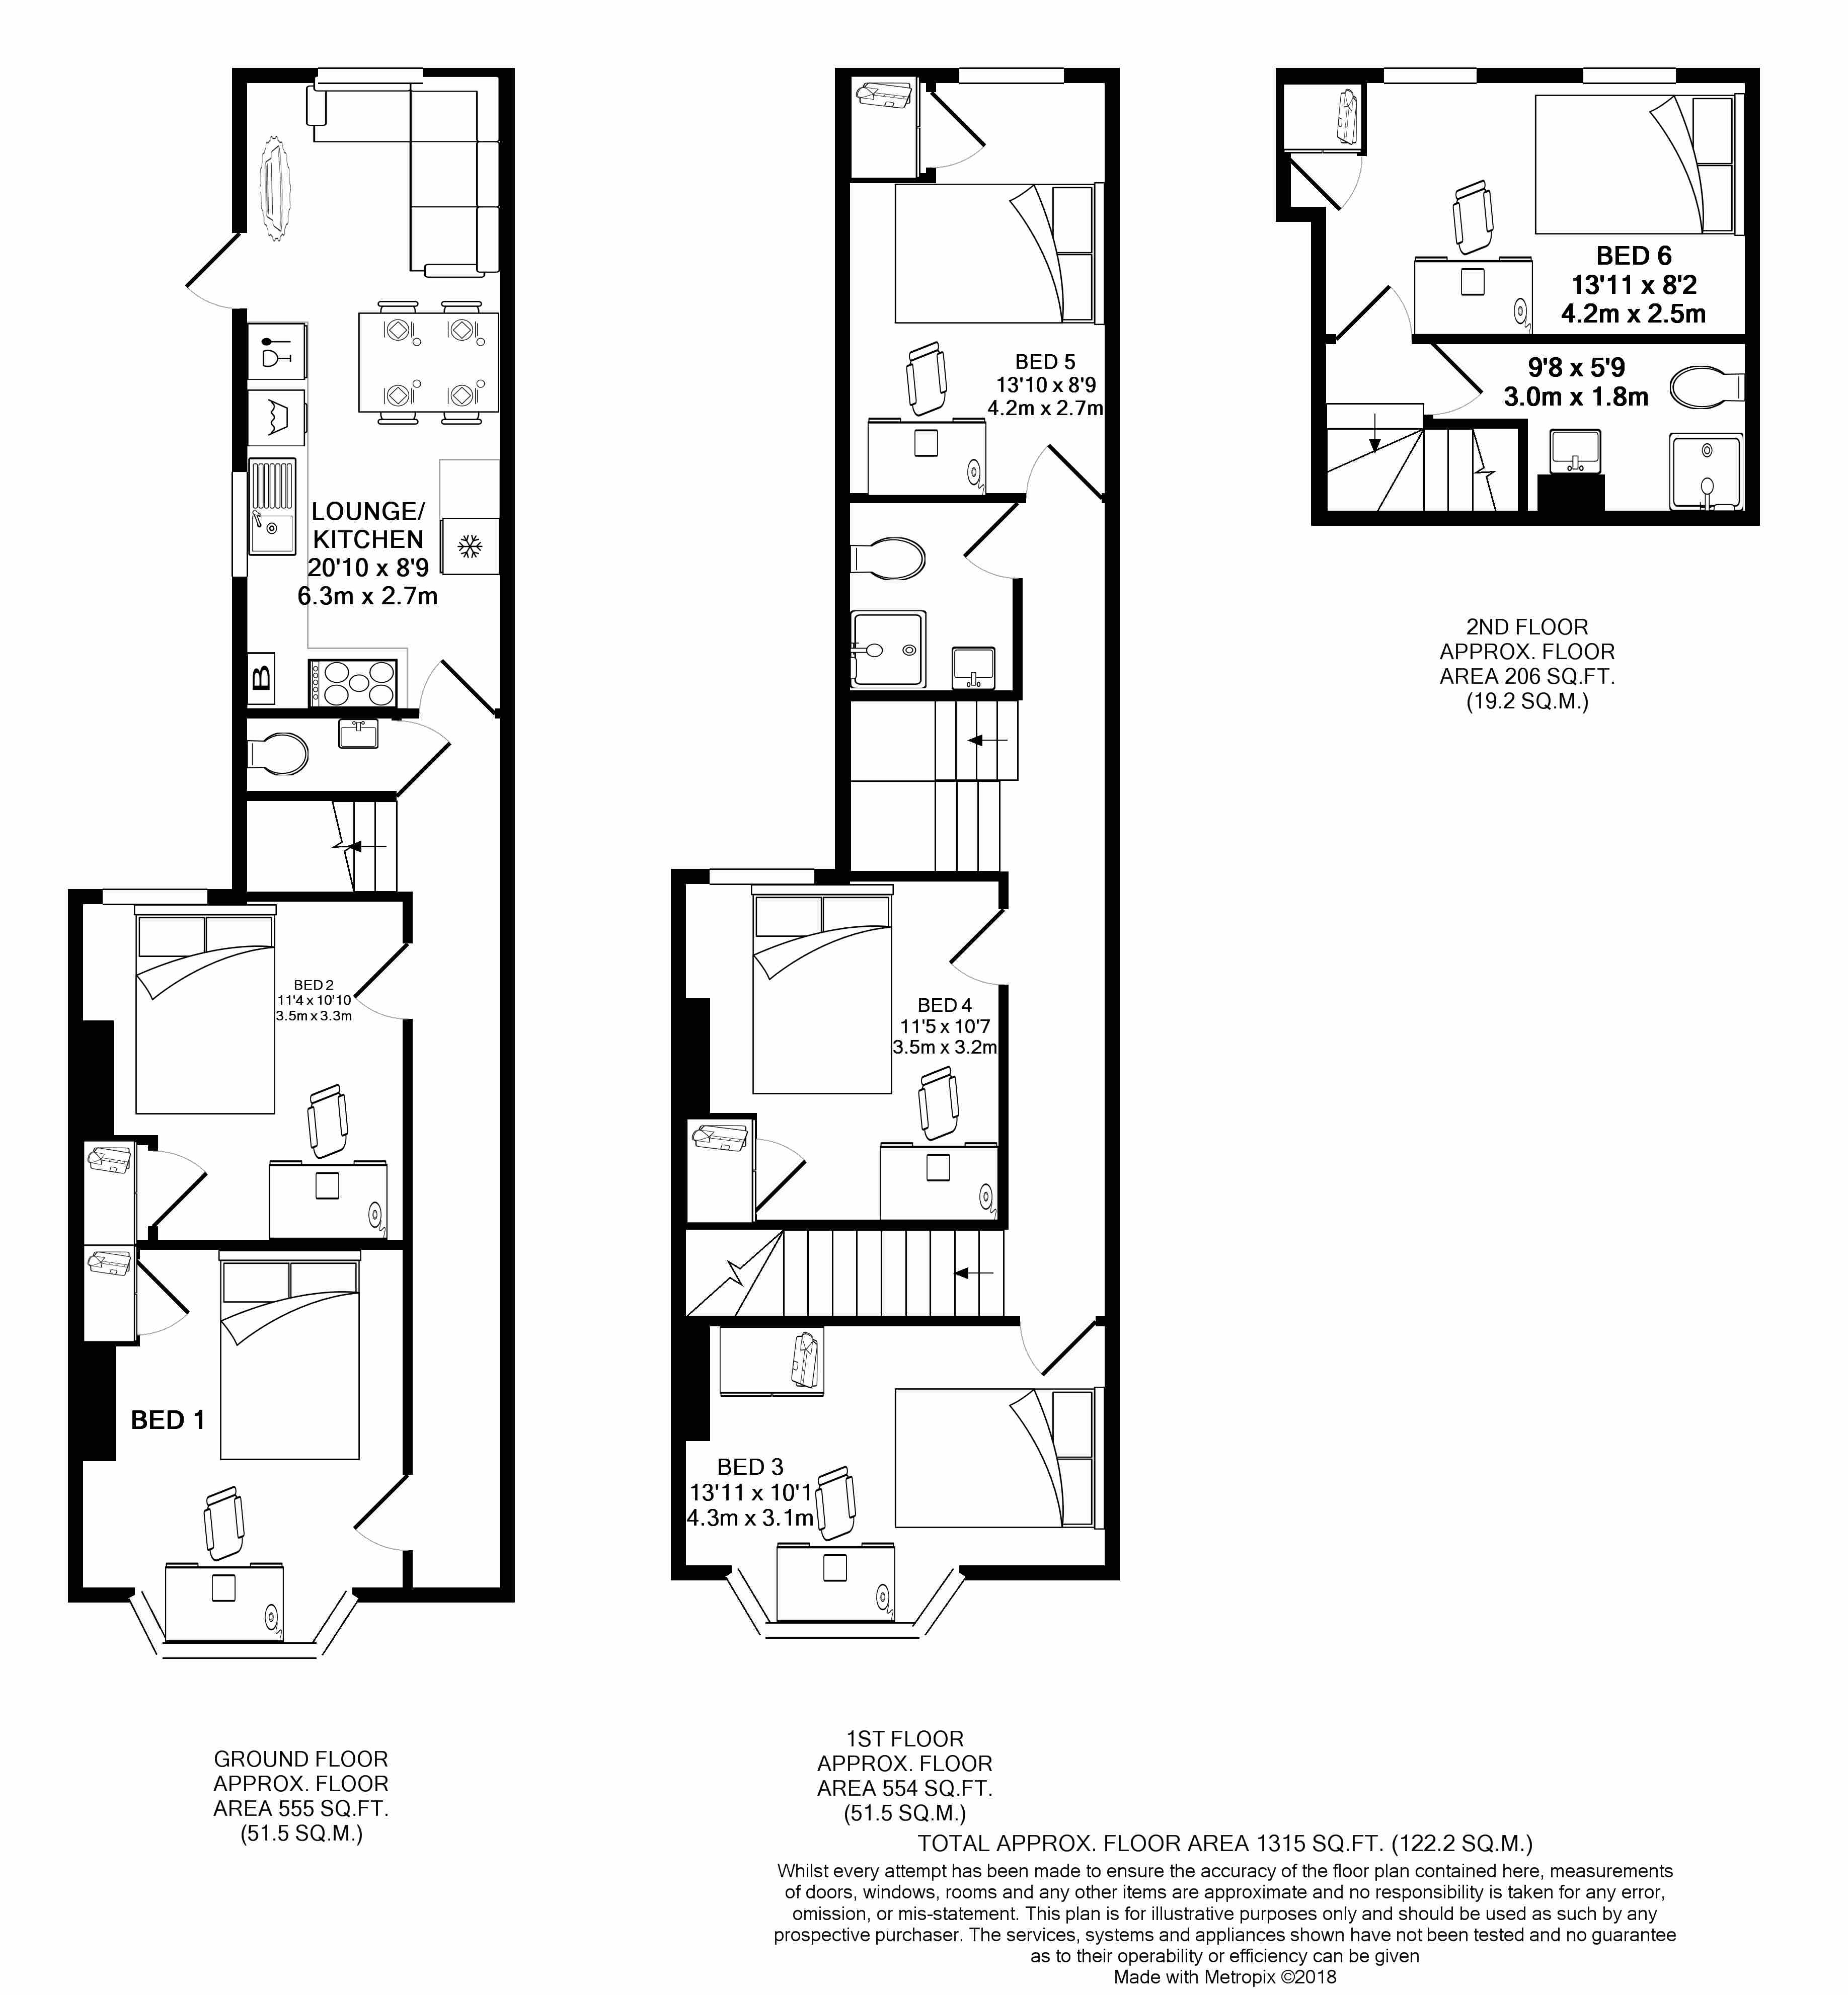 All floors plan